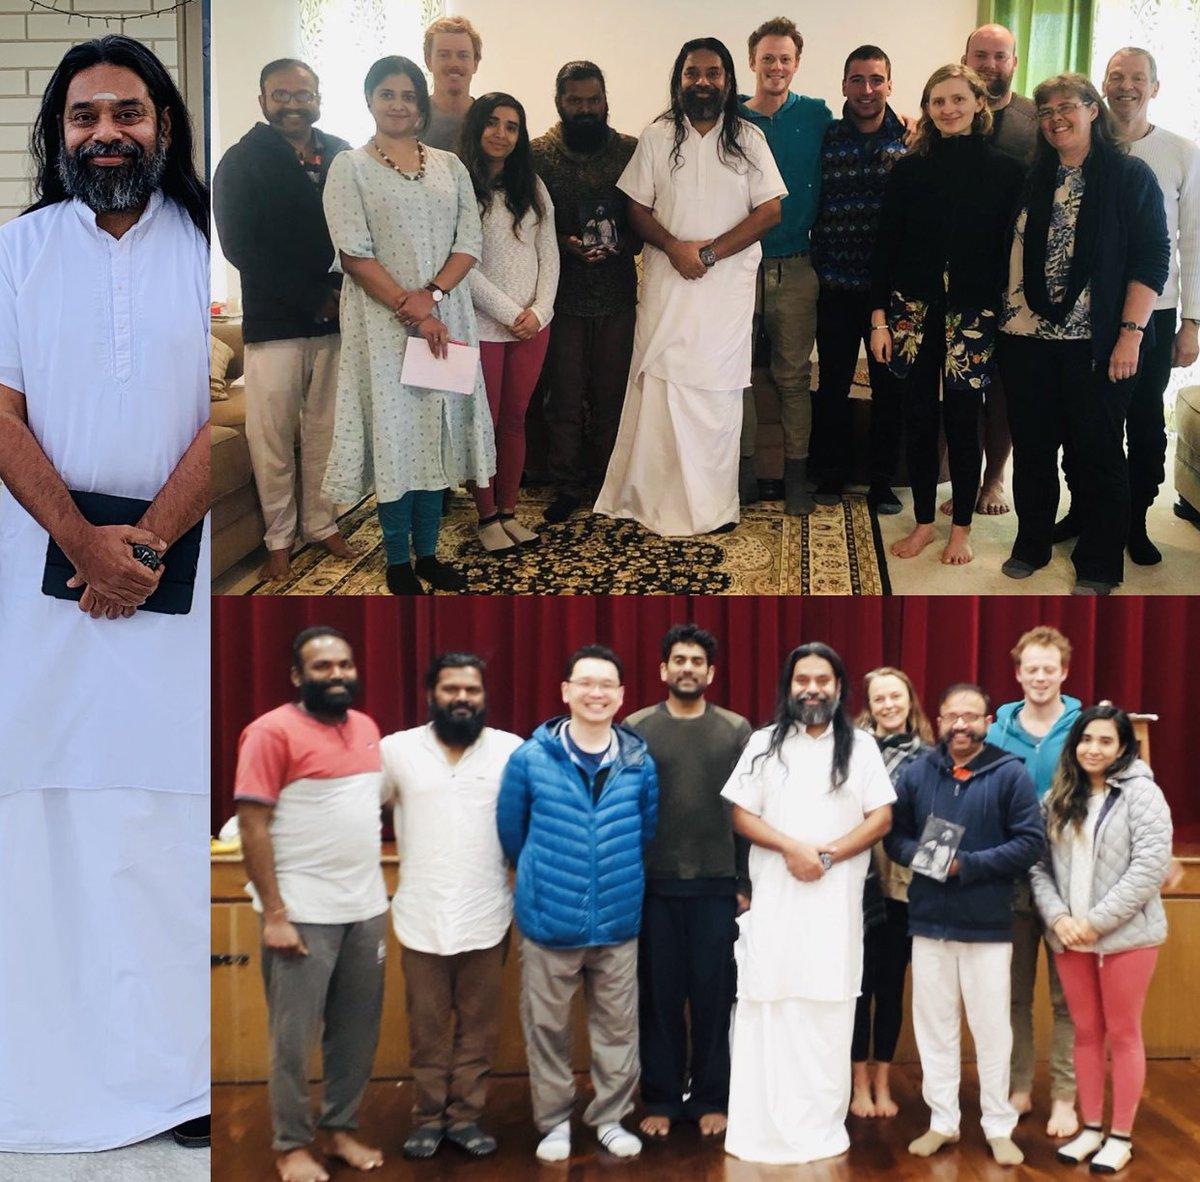 3 day SAHAJ SAMADHI MEDITATION Programme & 2 day SHAKTI KRIYA Programme concluded in Christchurch, New Zealand 🇳🇿 ( @SriSri ) #meditation #ArtOfMeditation https://t.co/19fKCi0u47